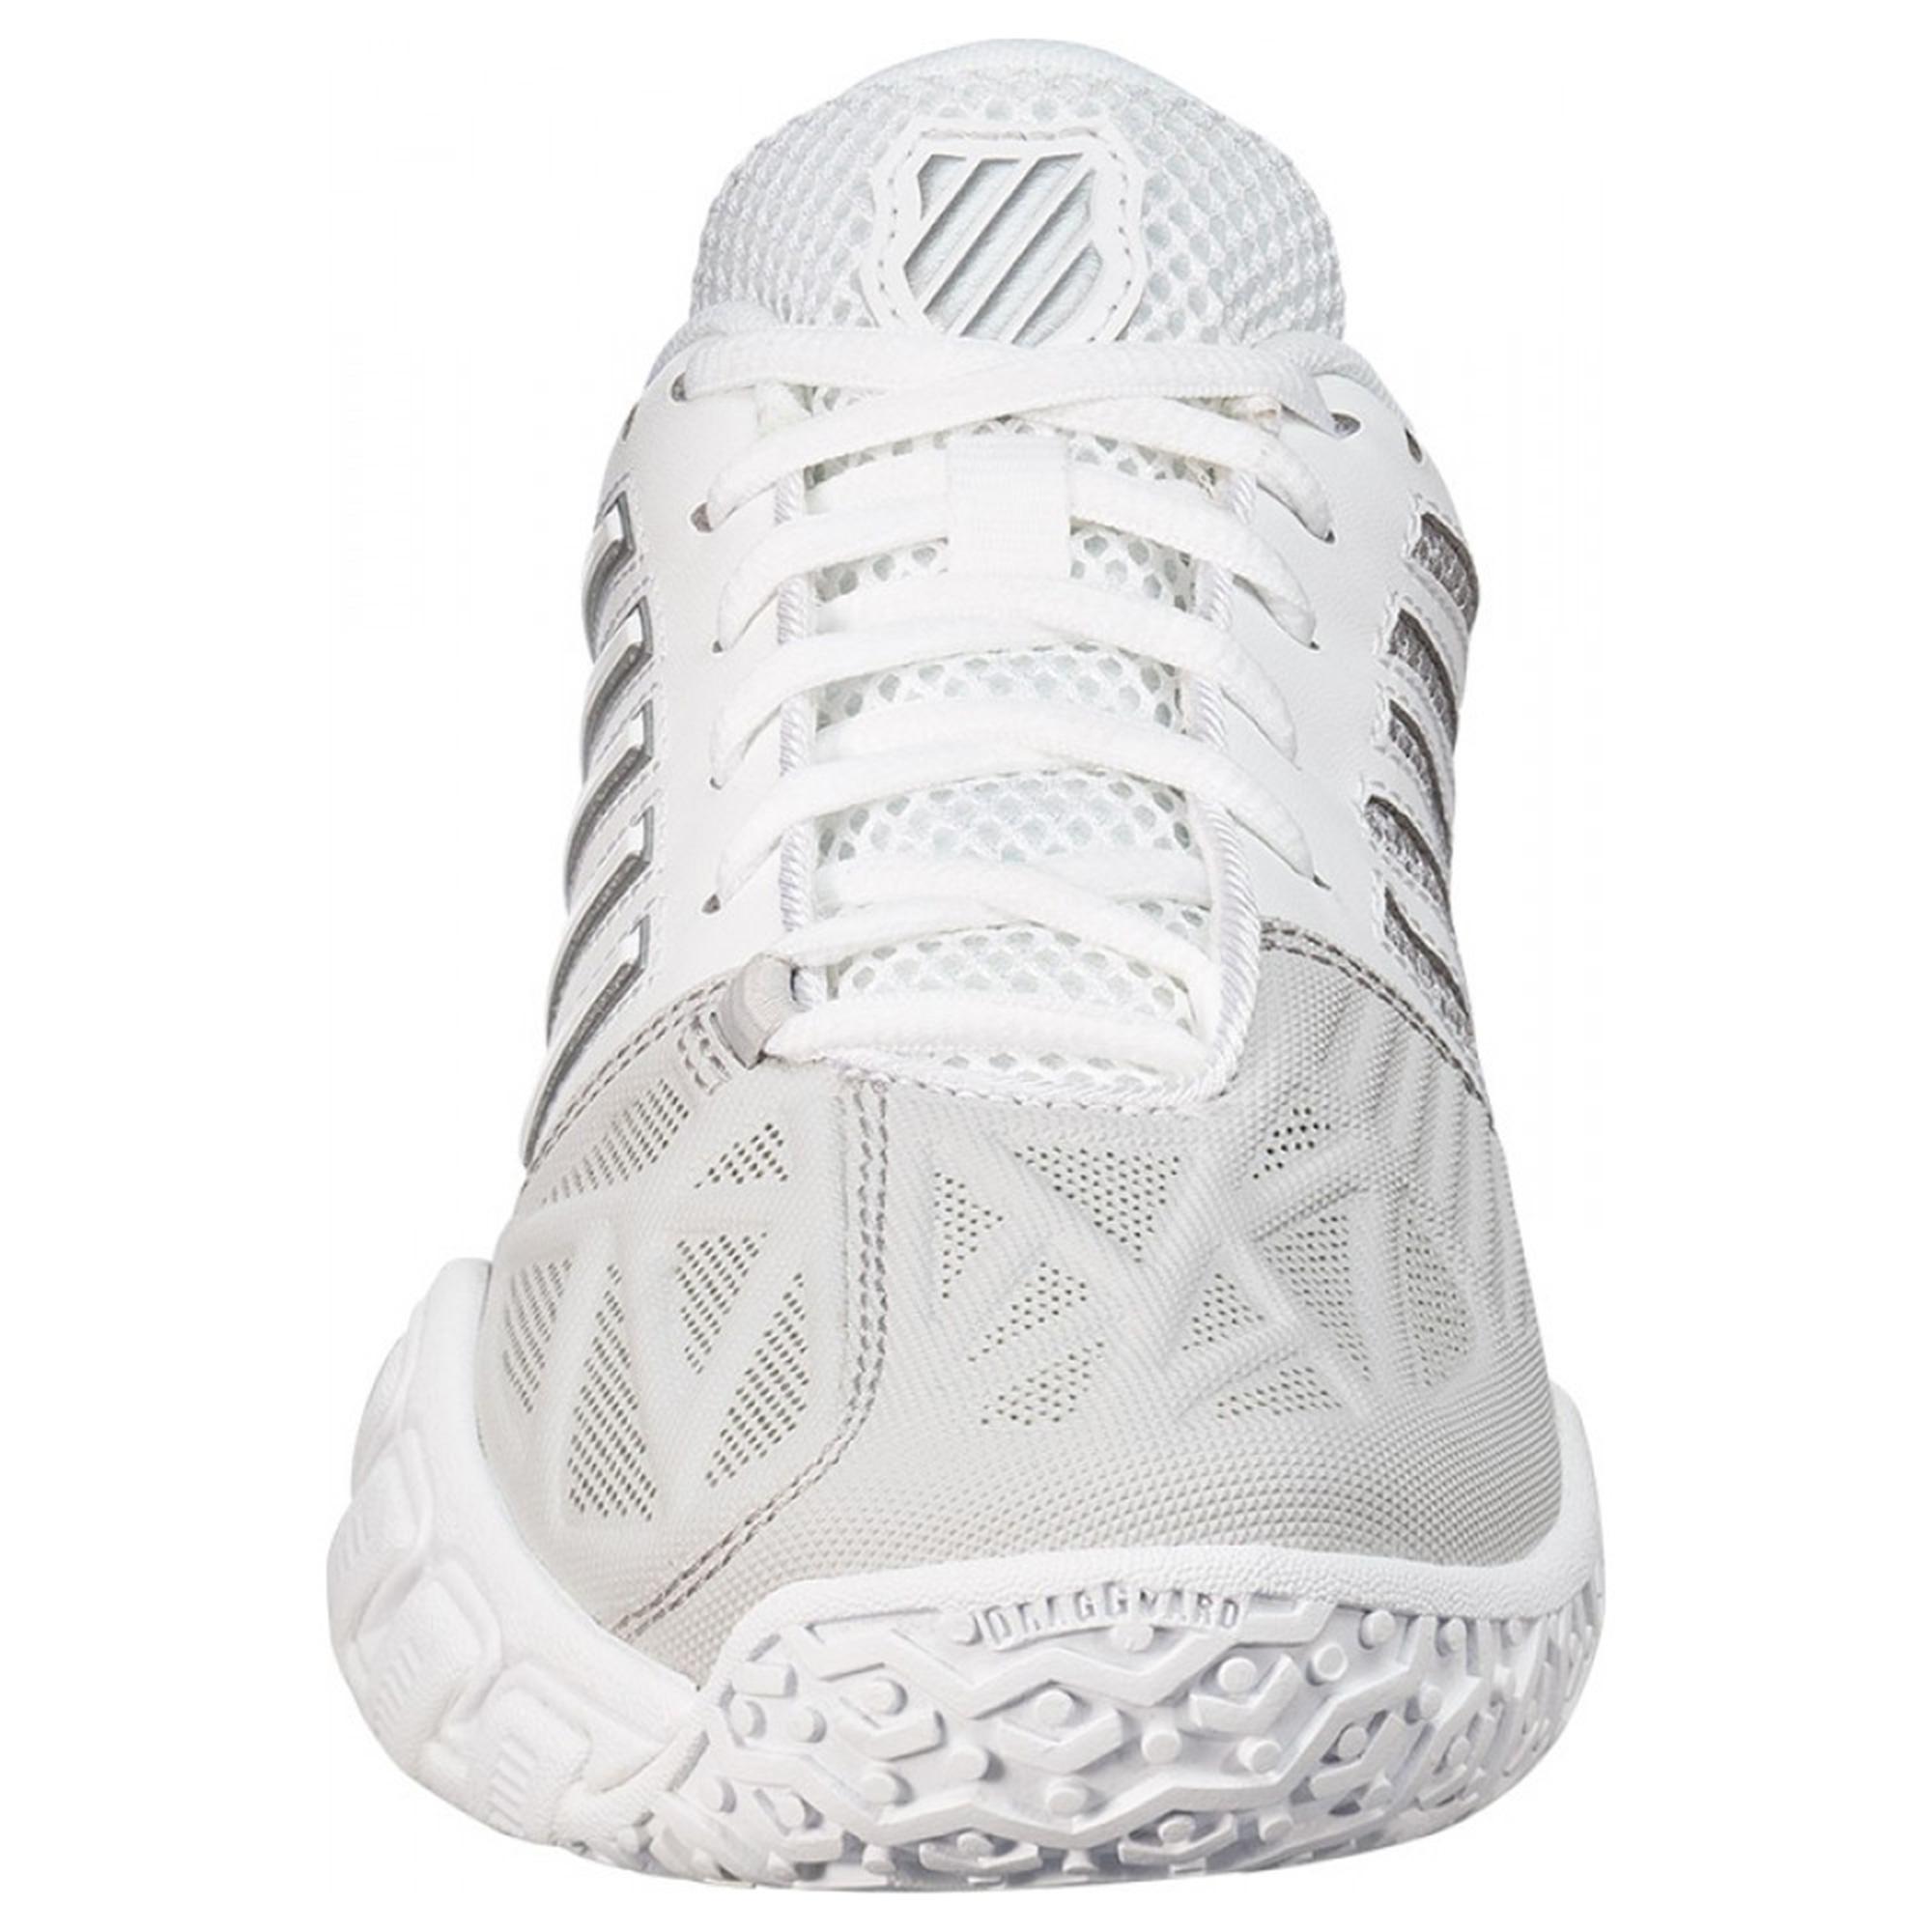 buy popular f9f82 b4cc6 K-Swiss Womens BigShot Light 3.0 Omni Court Tennis Shoes - White Silver